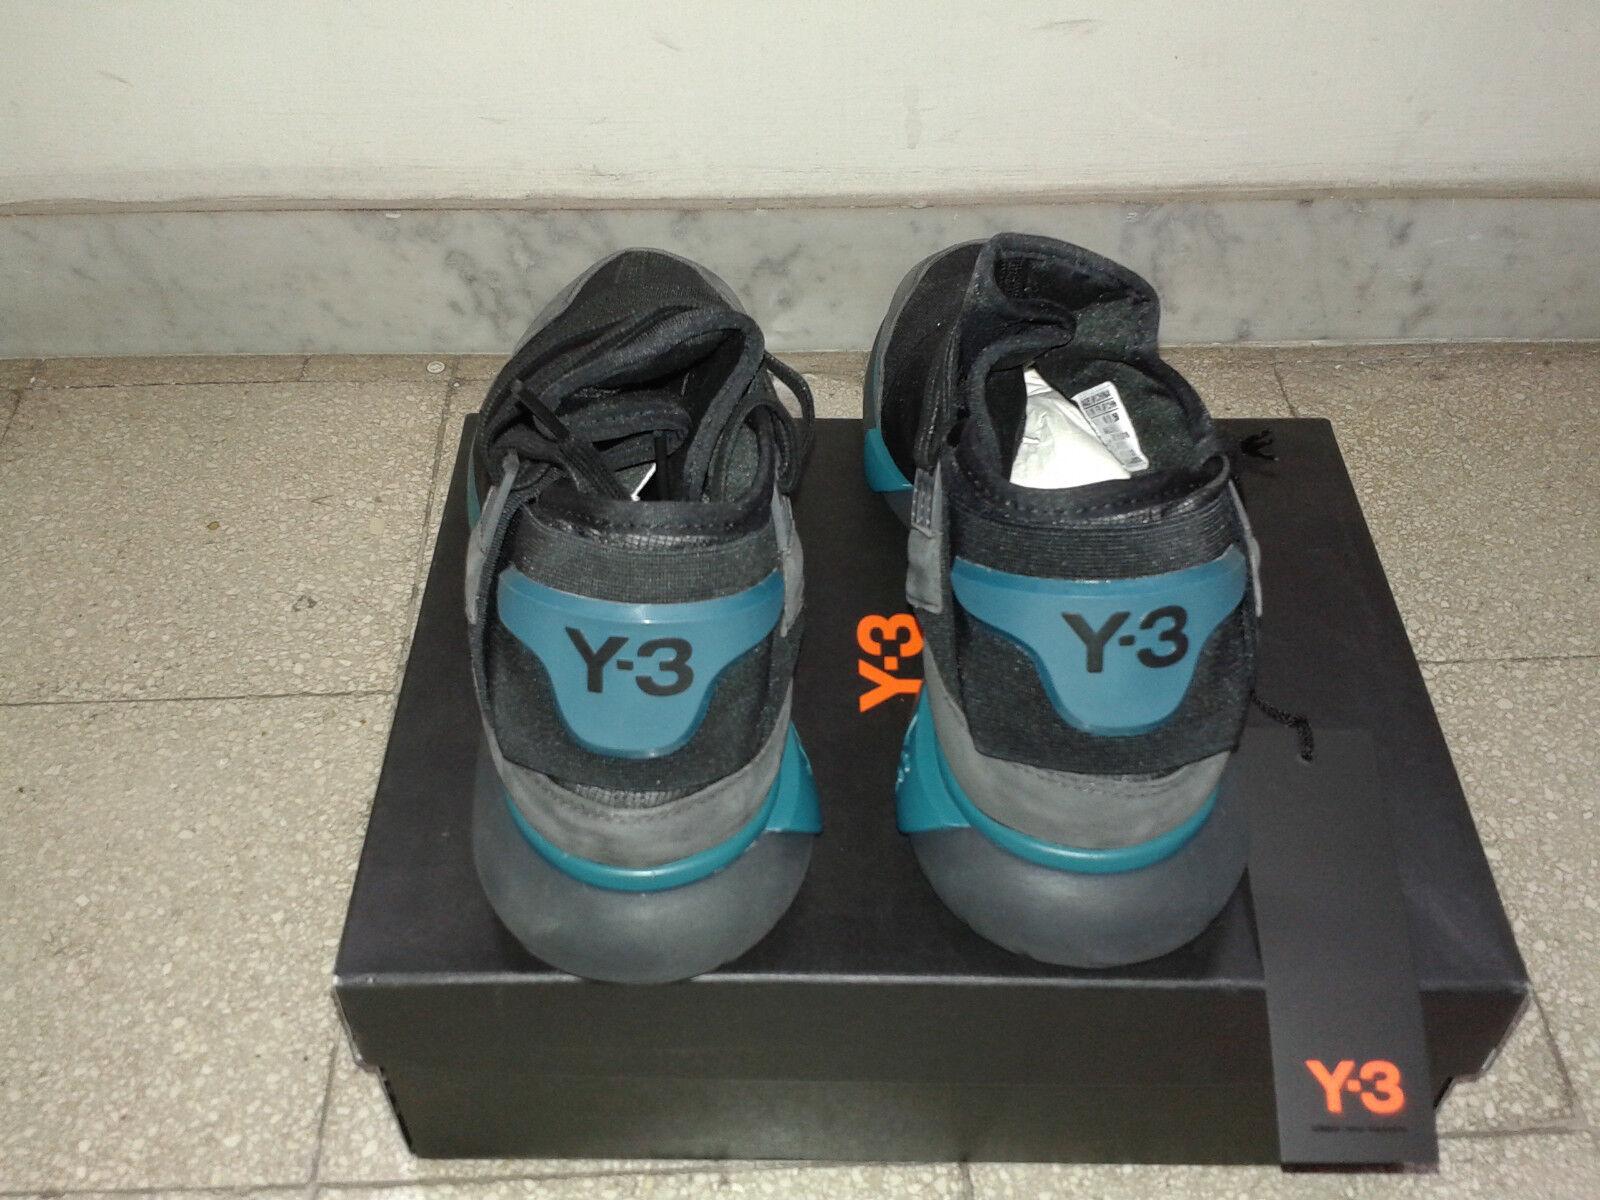 Adidas Y-3 Qasa High Suede Primeknit Yamamoto BB4735 nuove mai mai mai indossate c7b04b